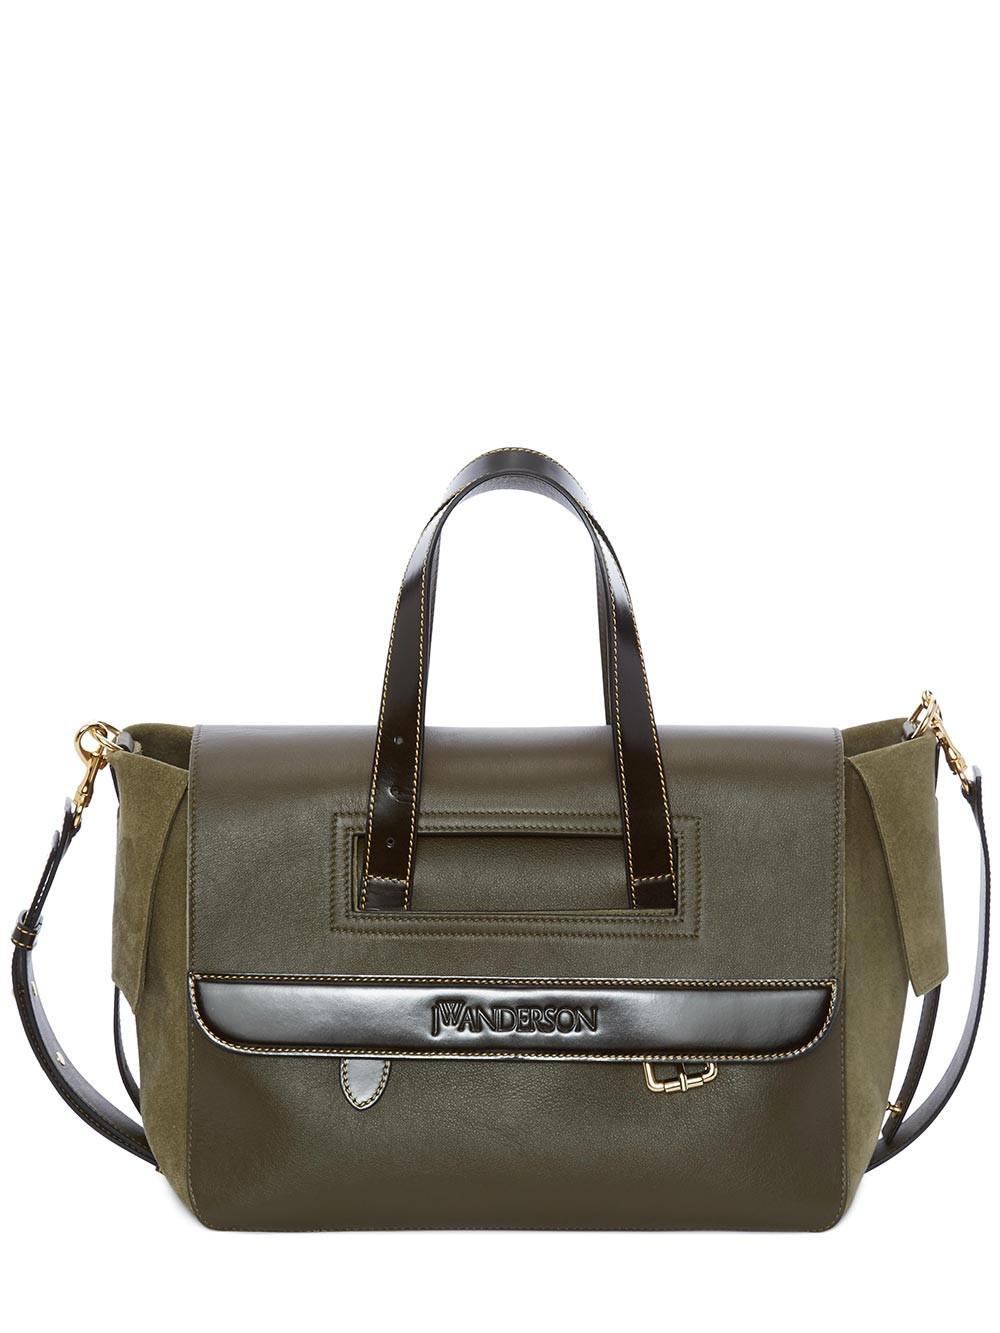 J.W. Anderson Khaki Tool Bag in Natural - Lyst de798f54785db